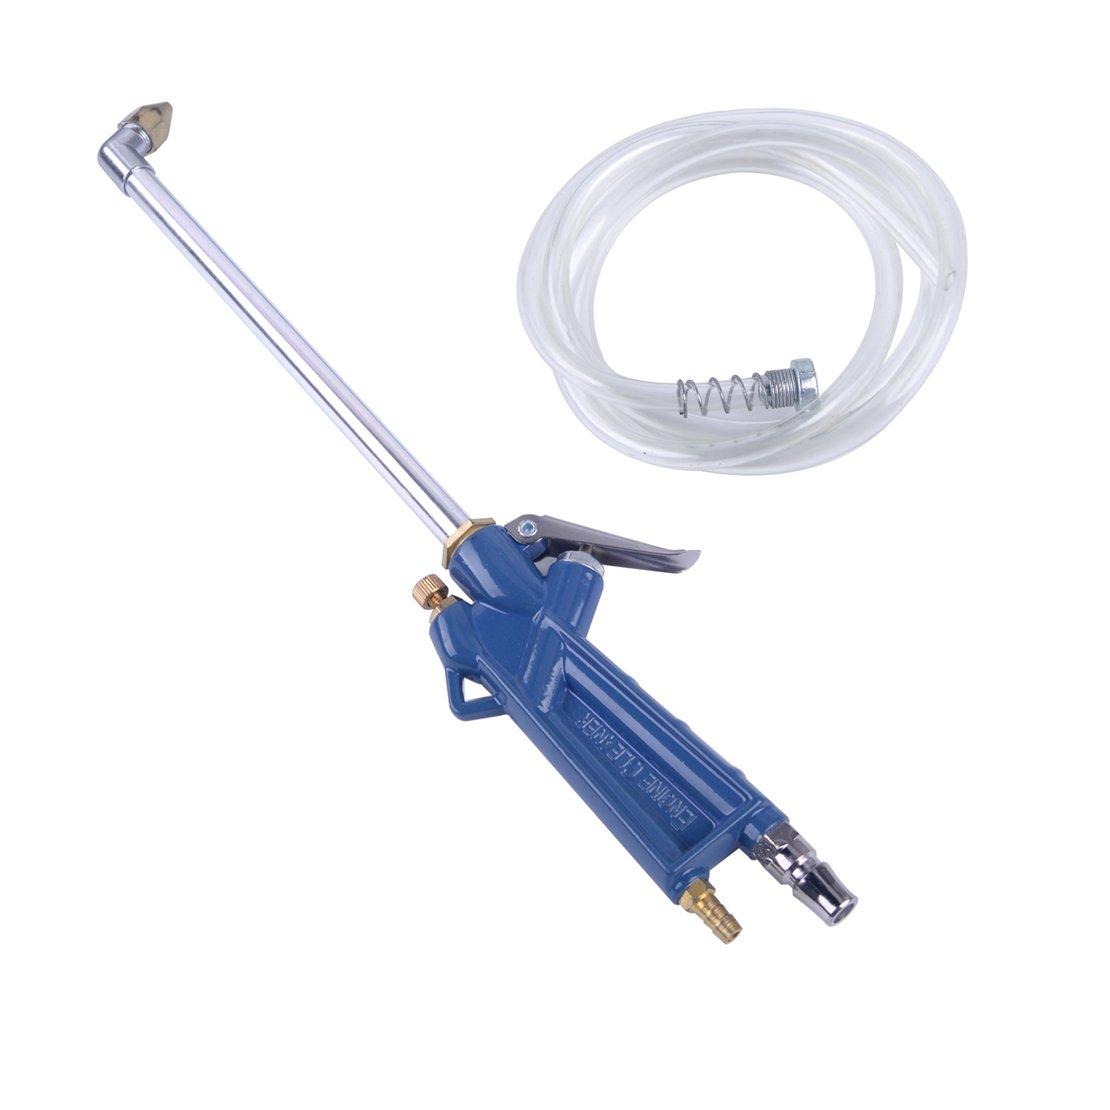 beler 1/4'' Car Engine Warehouse Cleaner Washer Gun Air Pressure Spray Dust Oil Clean Washing Tool